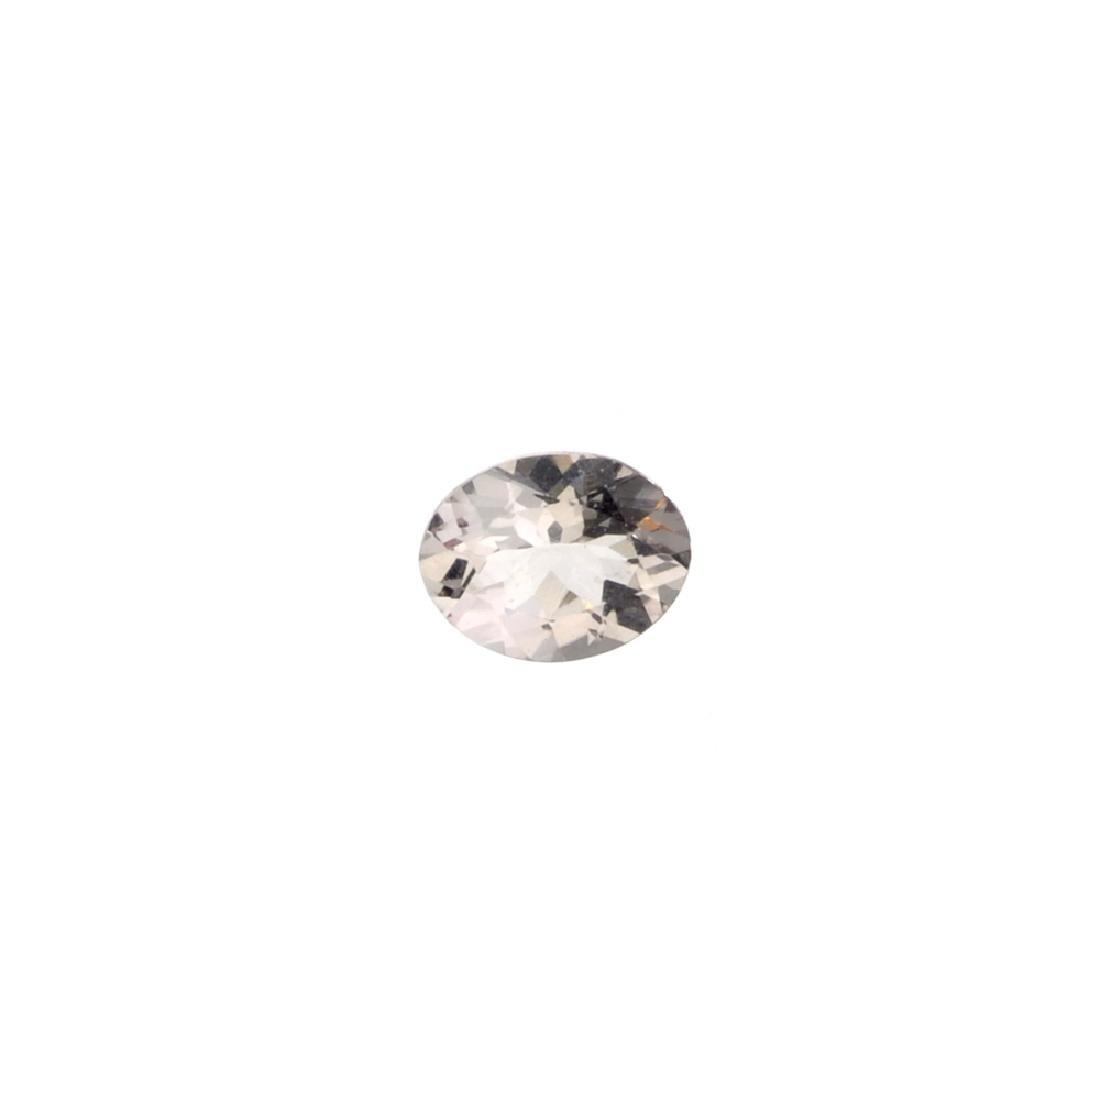 APP: 1.1k 1.60CT Oval Cut Morganite Gemstone